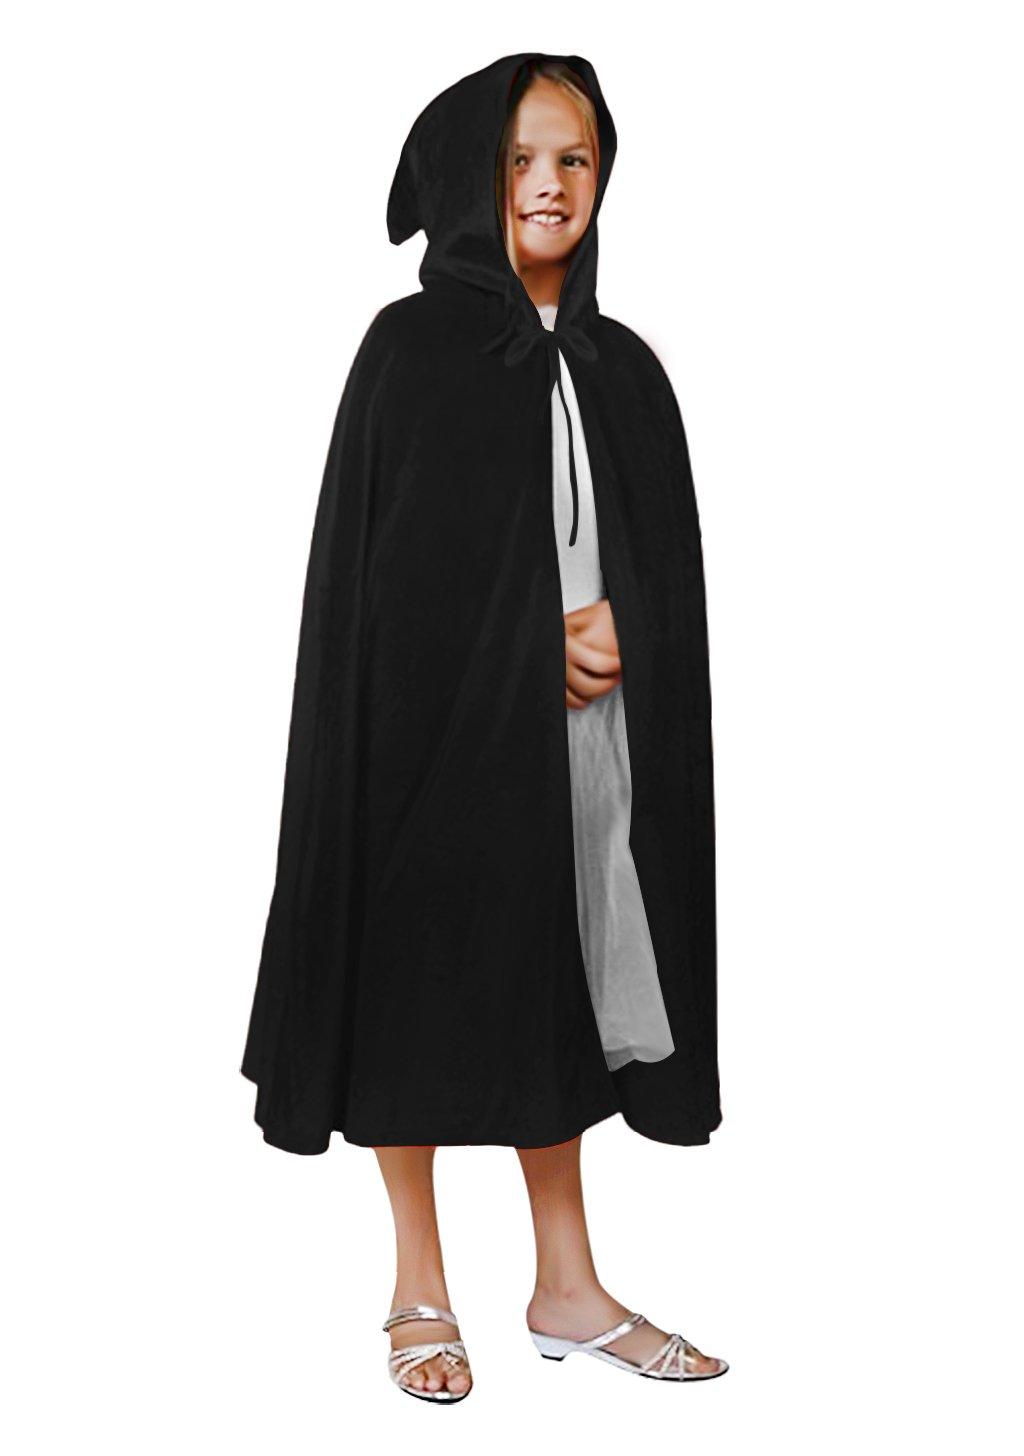 Kids Velvet Halloween Costume Long Witch Vampire Hooded Cloak Cape Fancy Dress Outfit